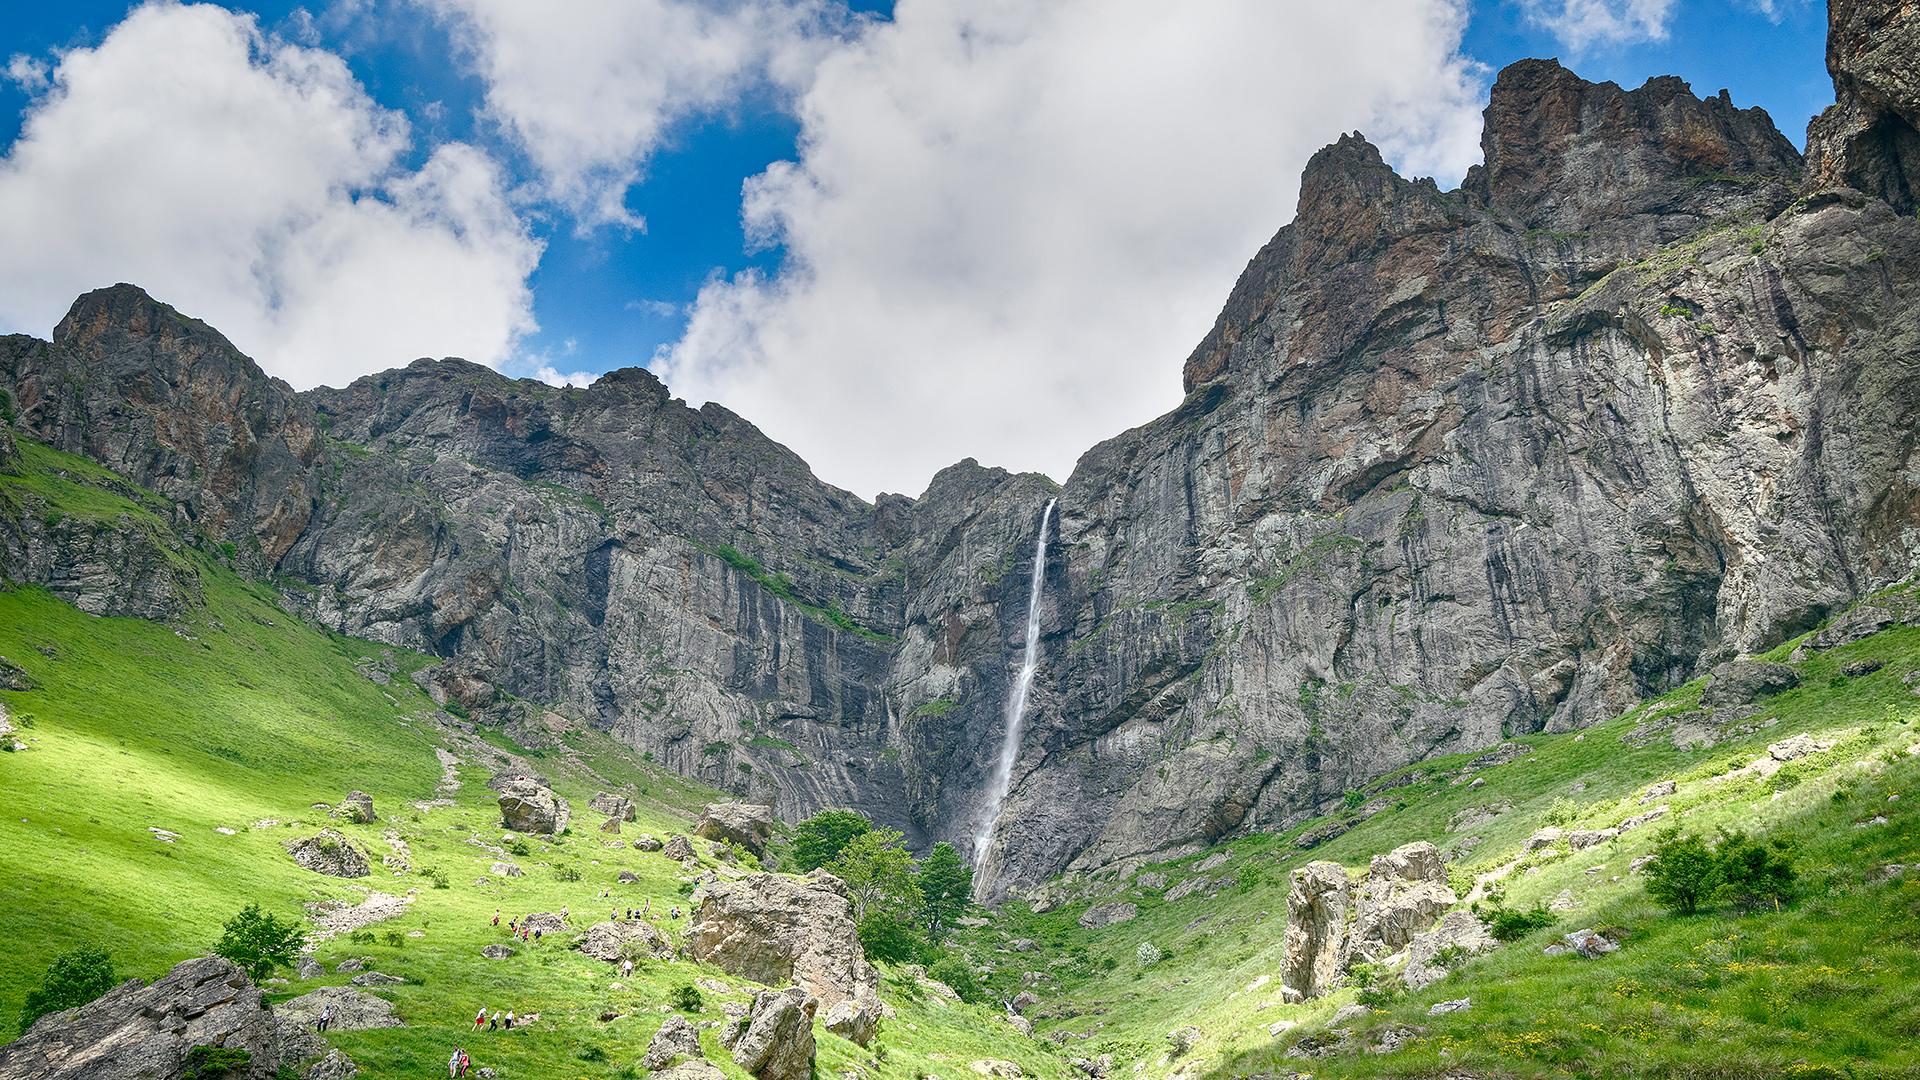 Raisko praskalo waterfall